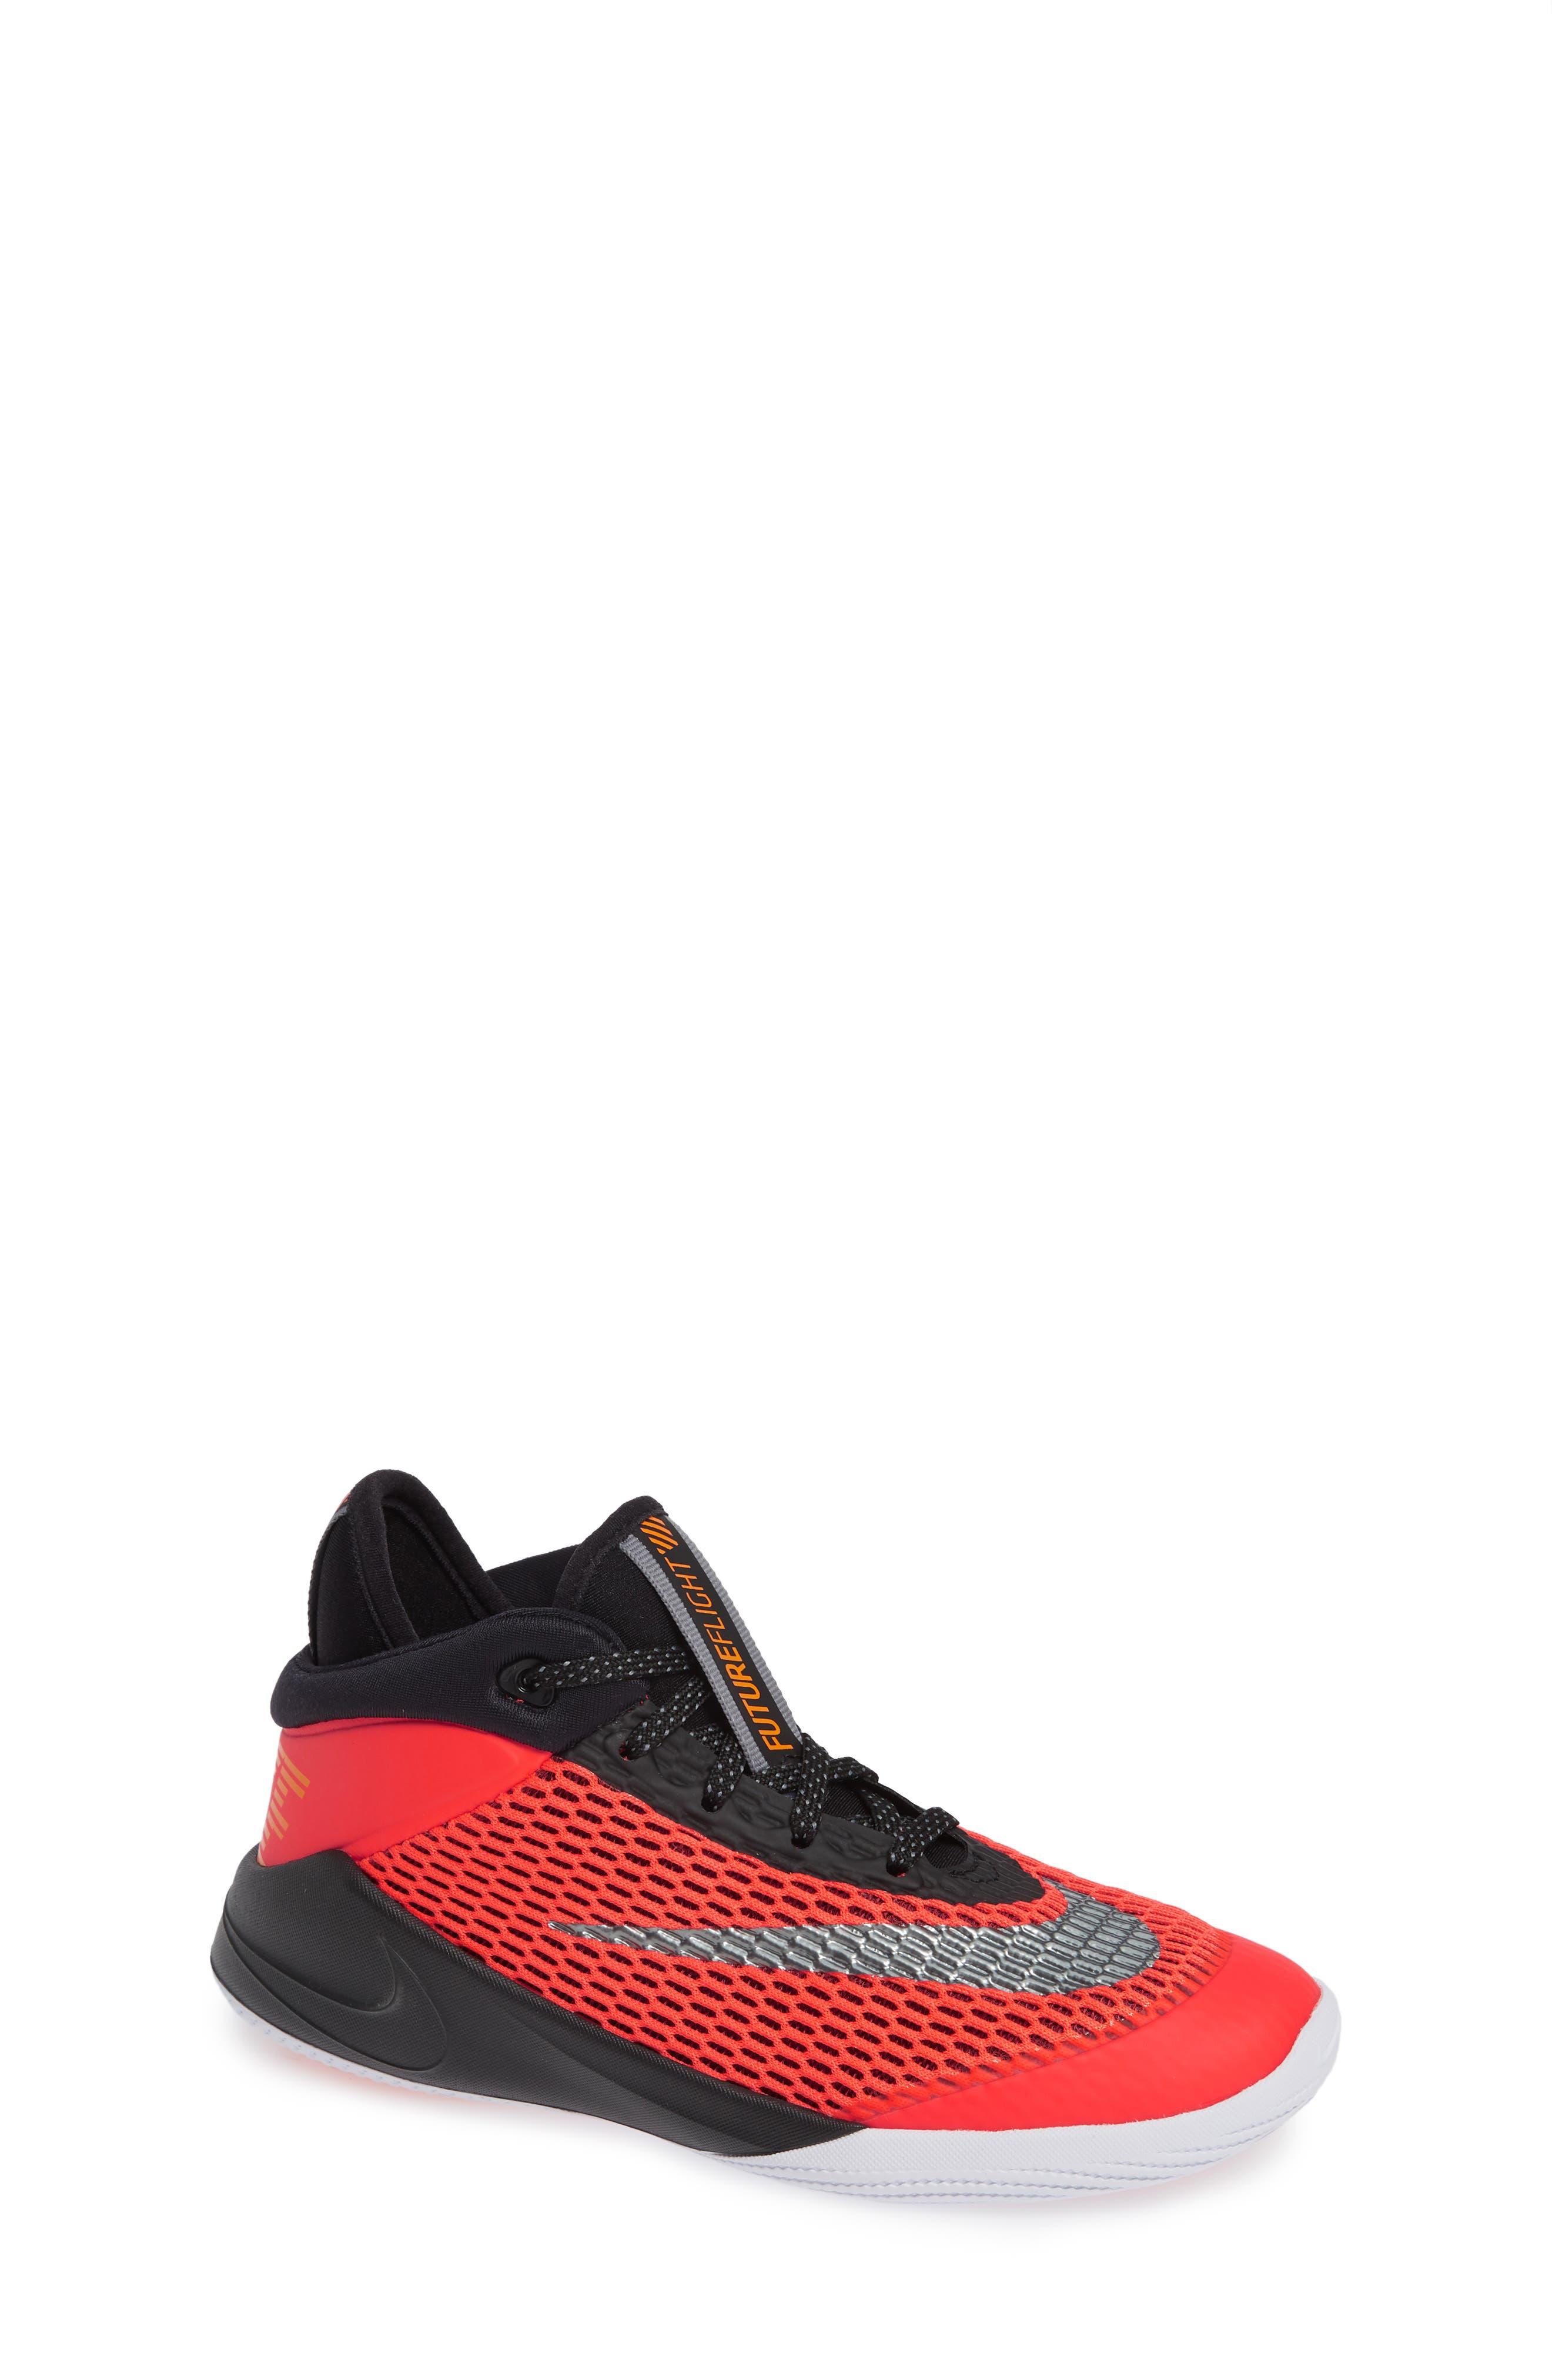 buy popular 5164e aa919 ... james lebron 03156 e0a8a  low price nike future flight basketball shoe  little kid big kid edbf4 696bb